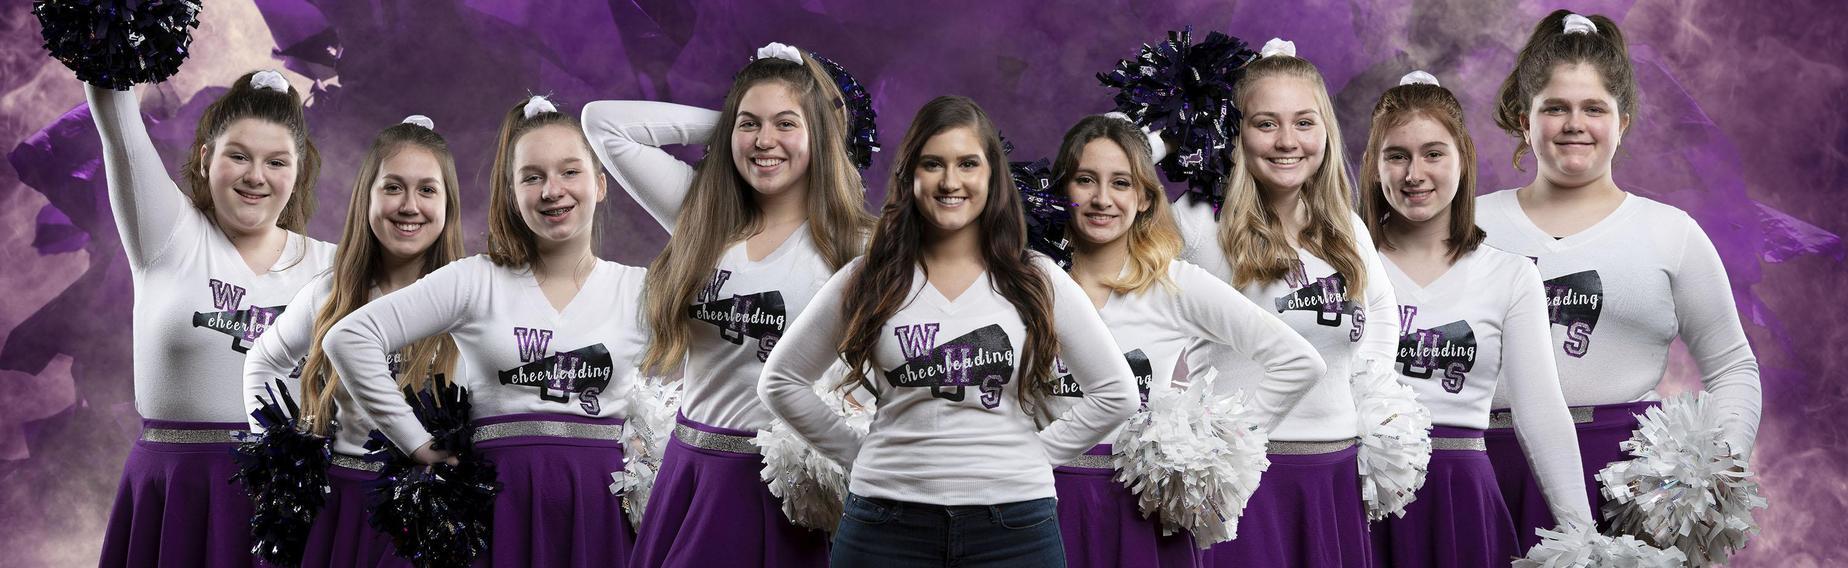 Cheerleading Team Photo